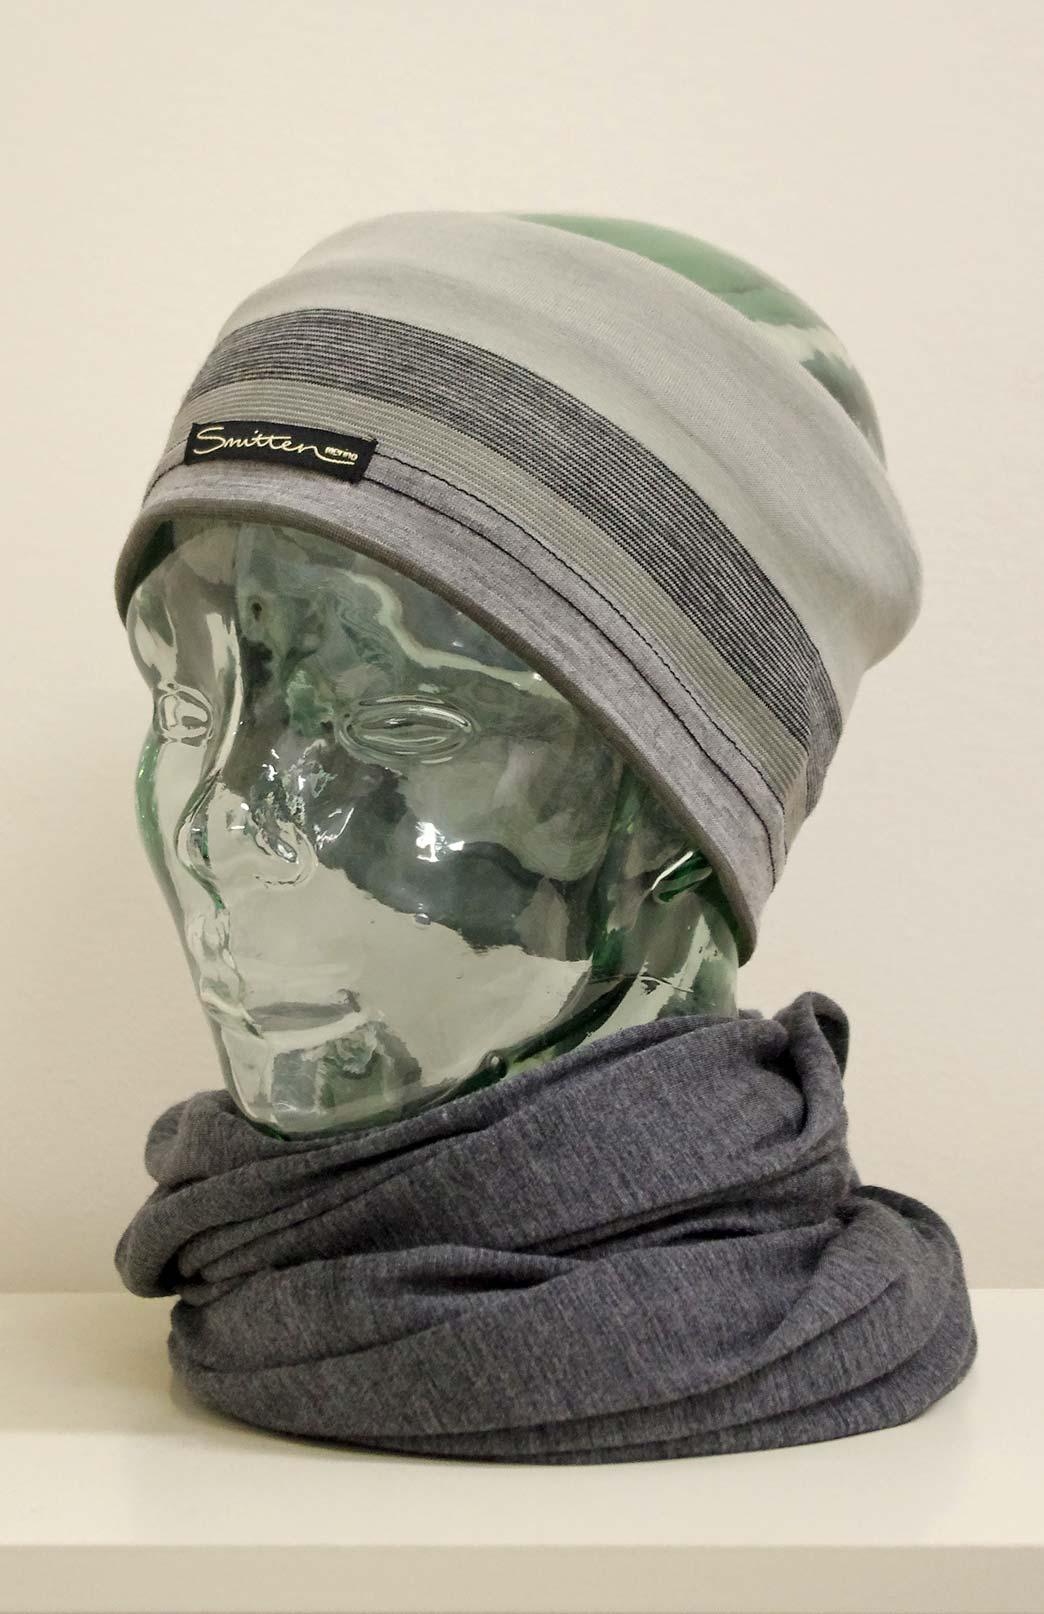 Headband / Ear Warmer - Unisex Black Grey Mutli Merino Wool Headband and Ear Warmer - Smitten Merino Tasmania Australia